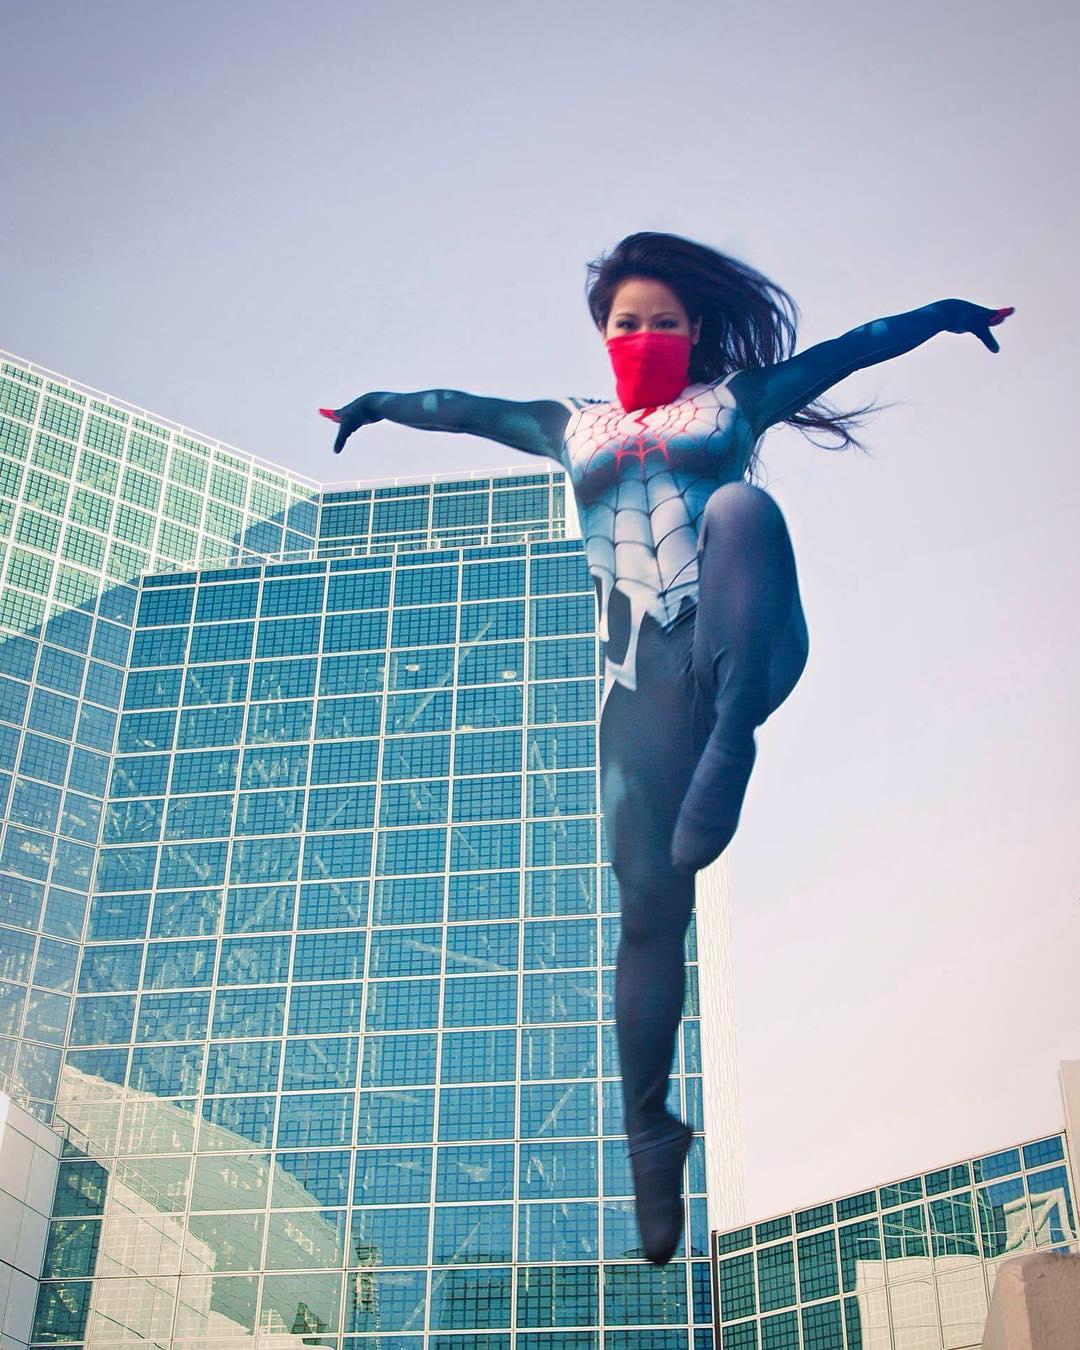 78 fotos de lindas cosplayers